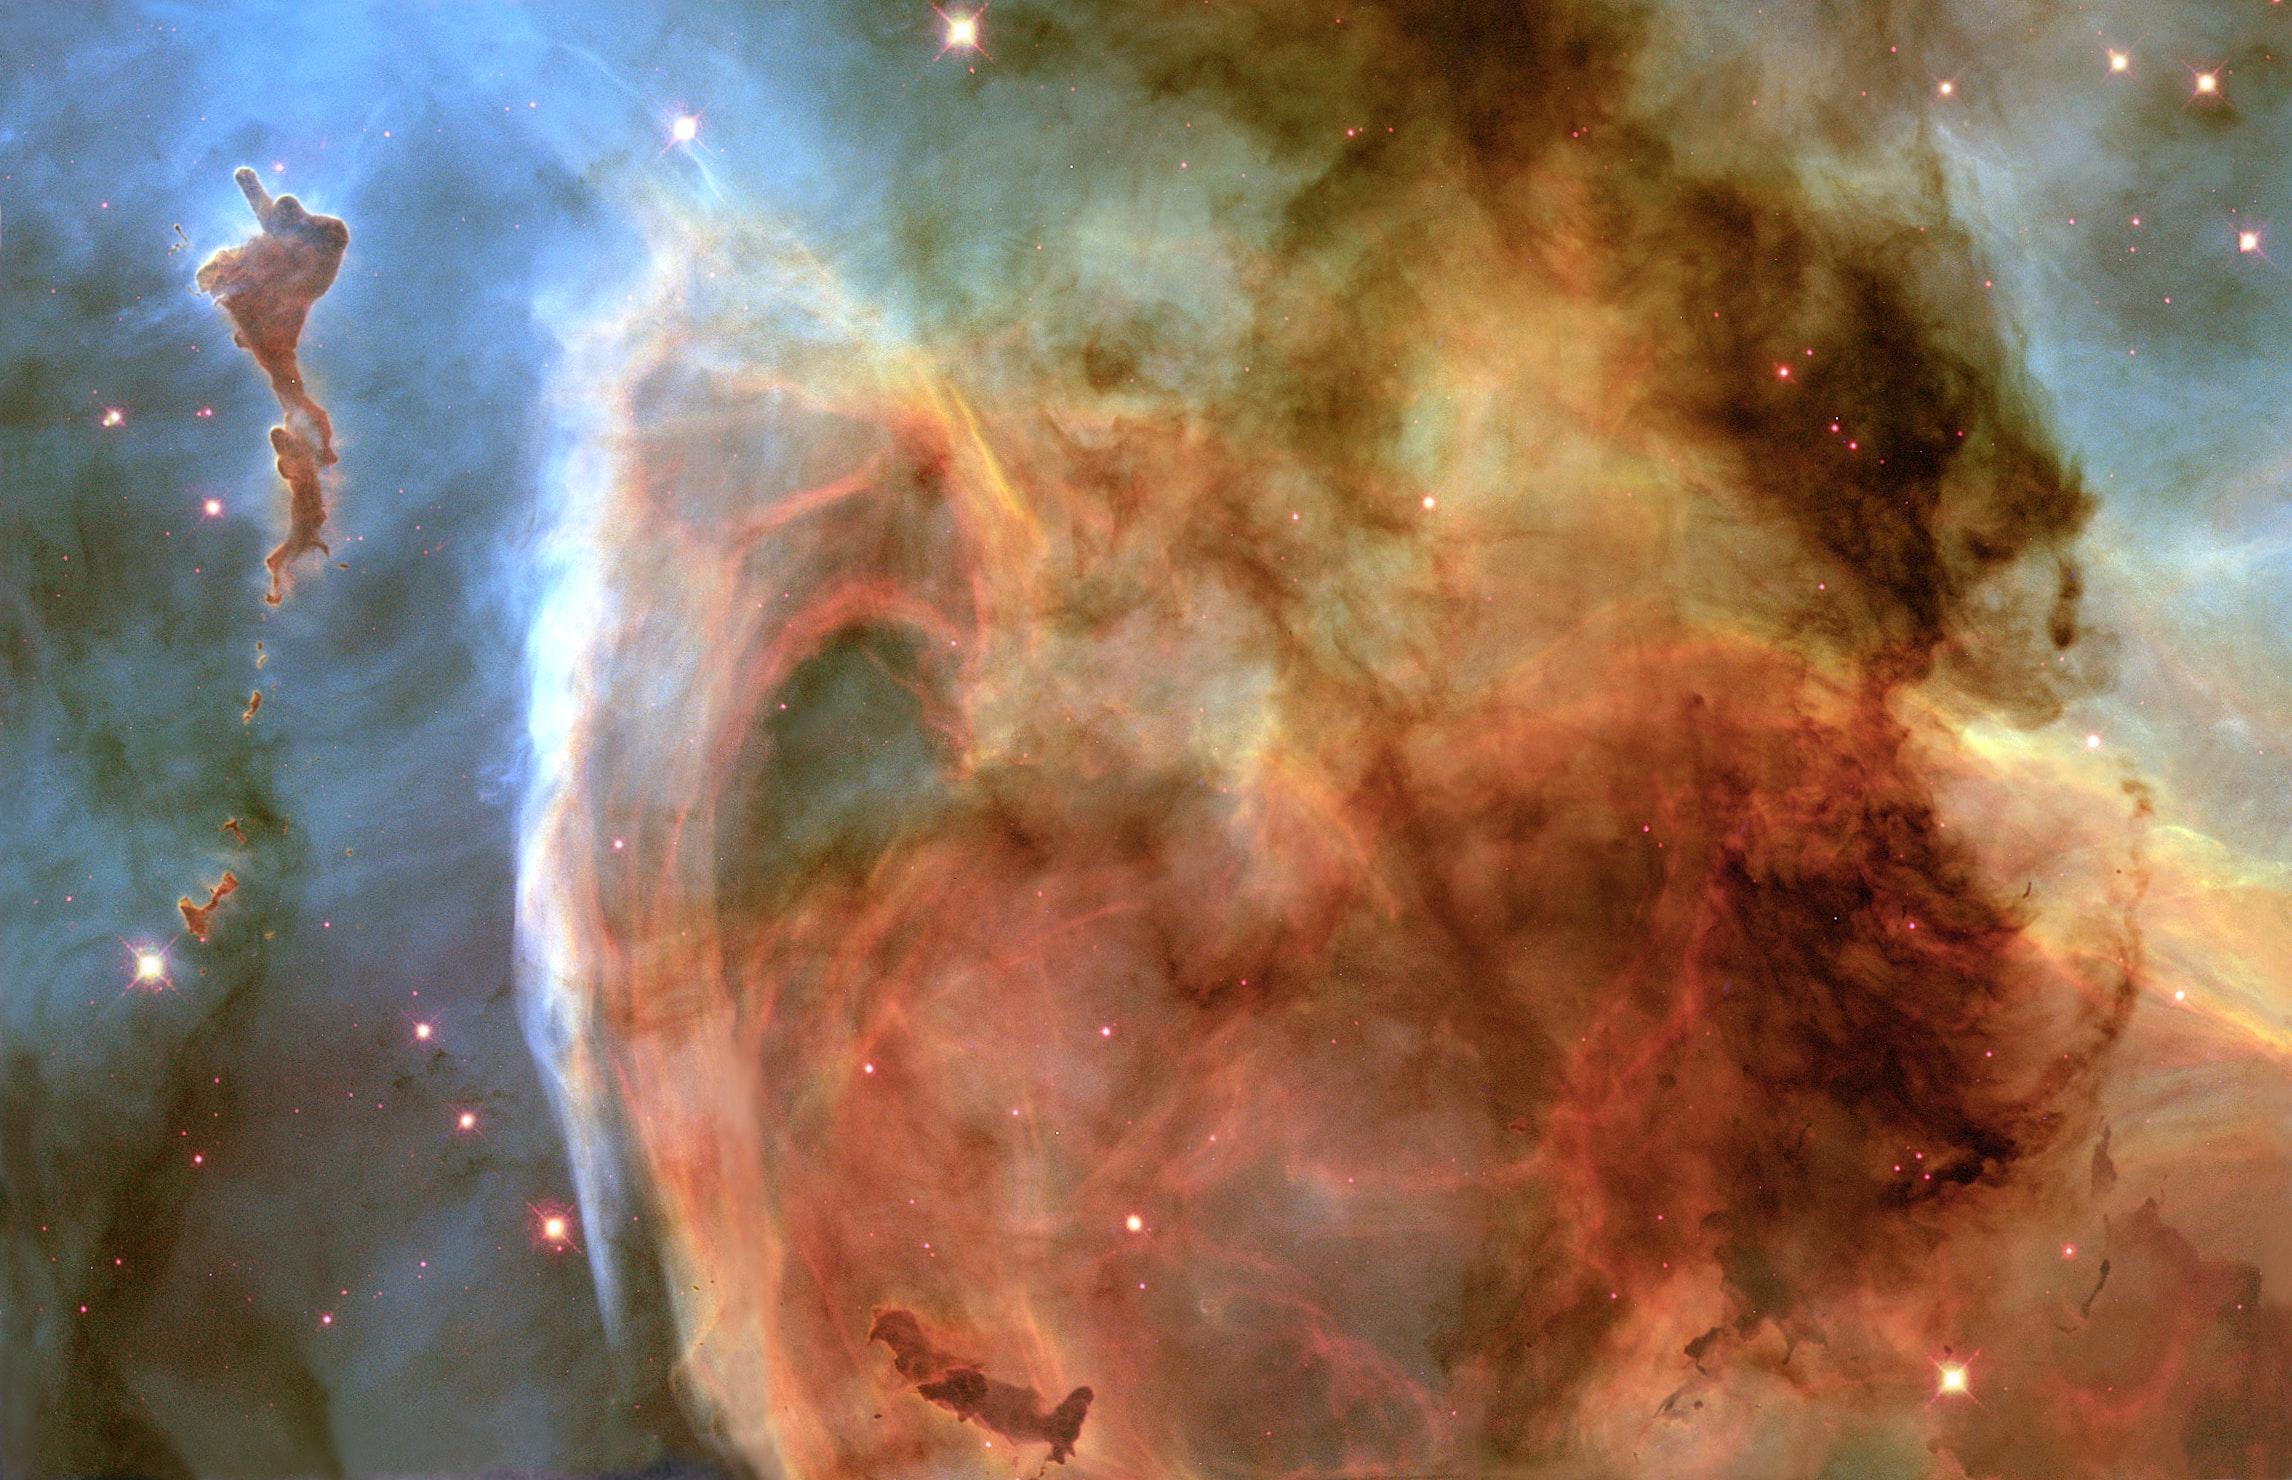 comet - Research News Scotland